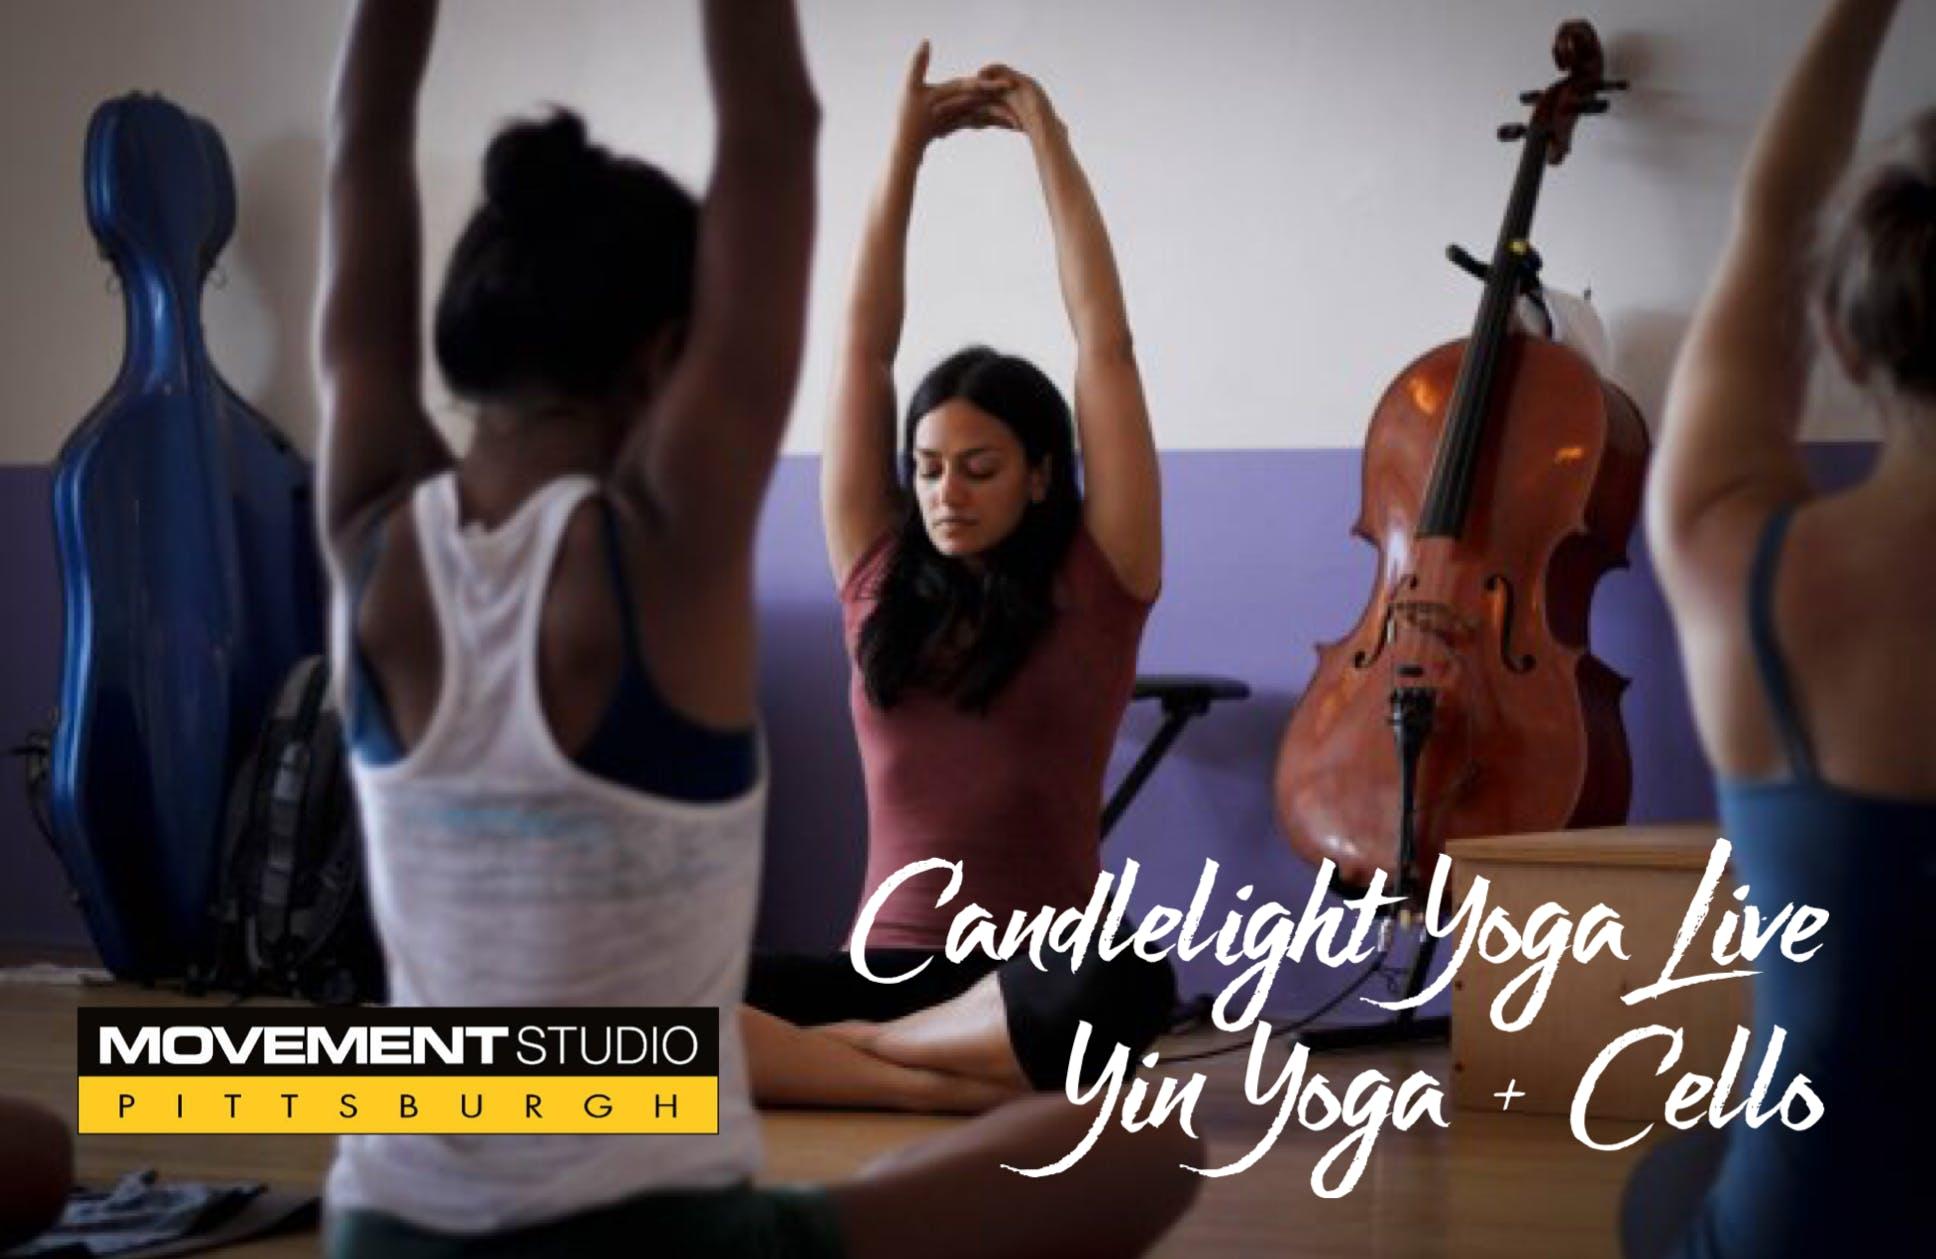 CANDLELIGHT YOGA LIVE - YIN YOGA + CELLO - 15 JUL 2018